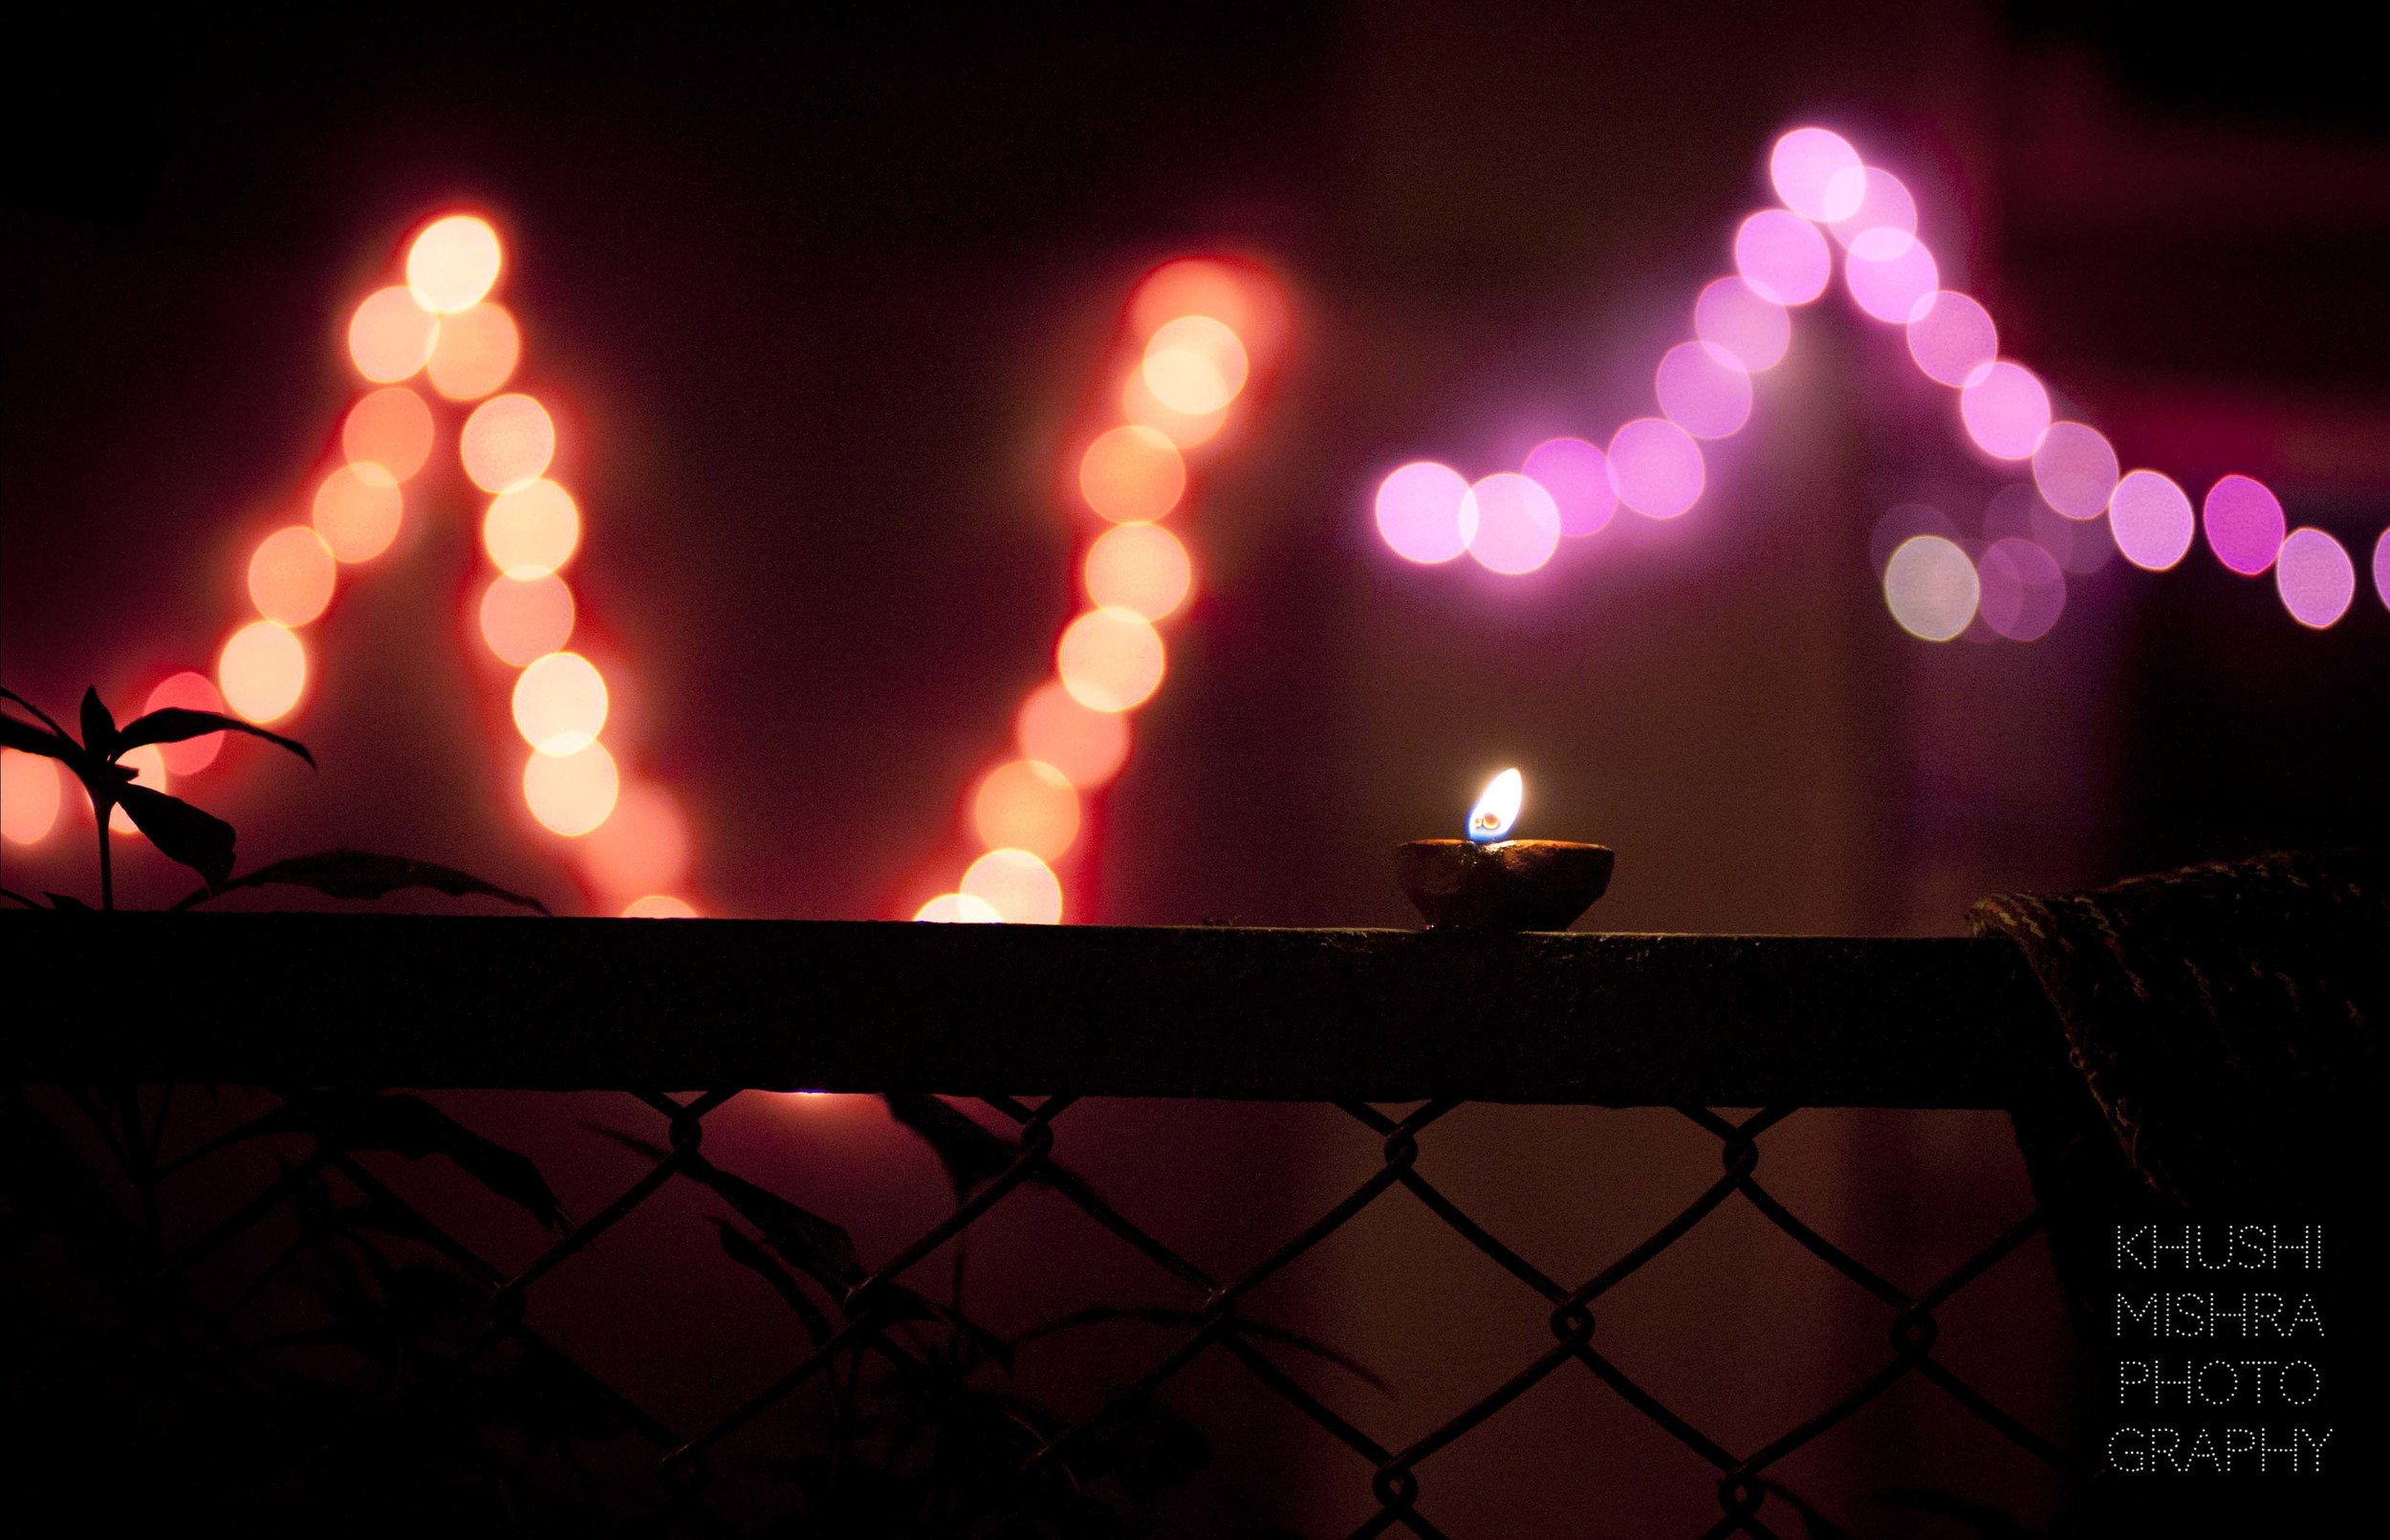 neighbour diwali_diwali_dsc_5213.jpg